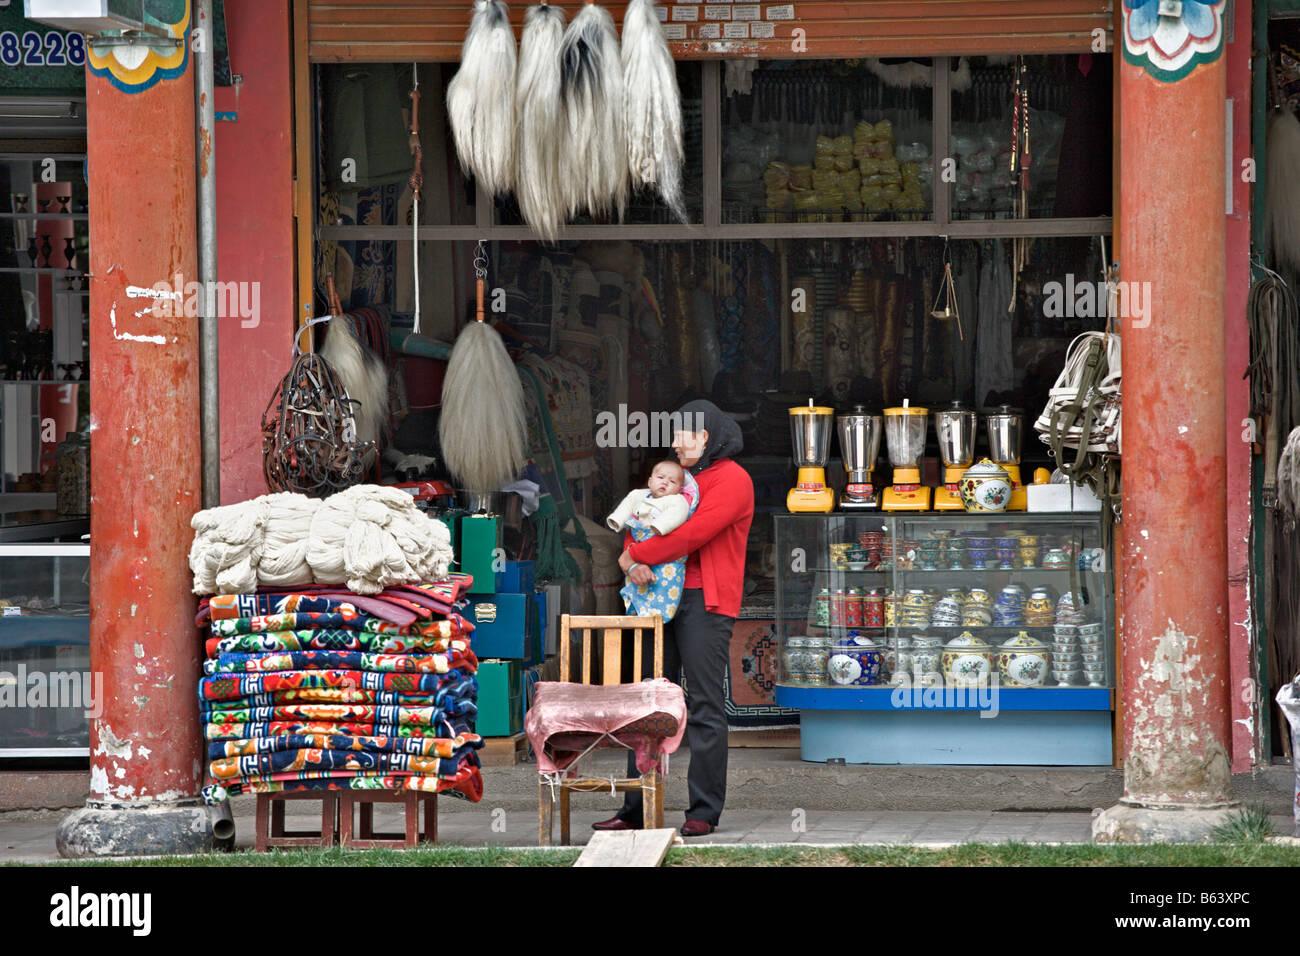 Tibetan storefront with mother baby. Store sells horse halters, rugs, blenders, et cetera, Zhongdian (Shangri-La), Stock Photo